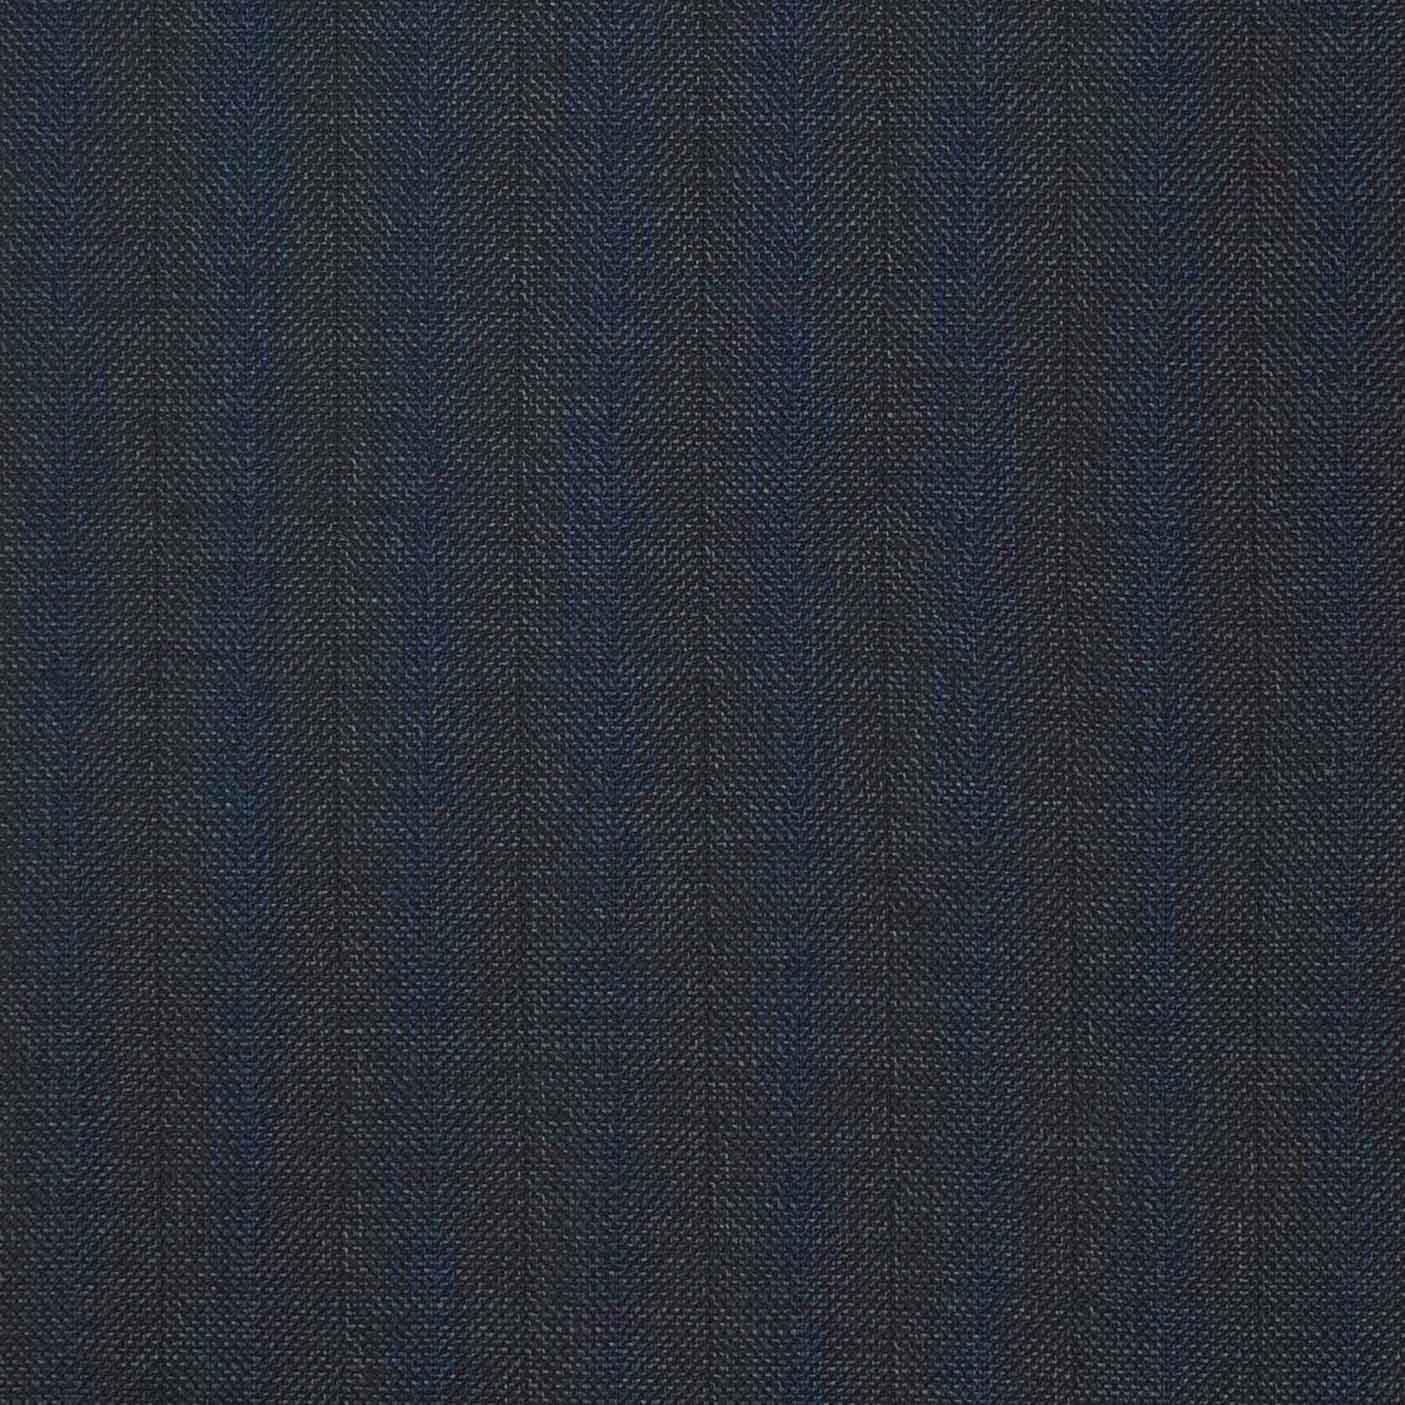 8118 0820 0001